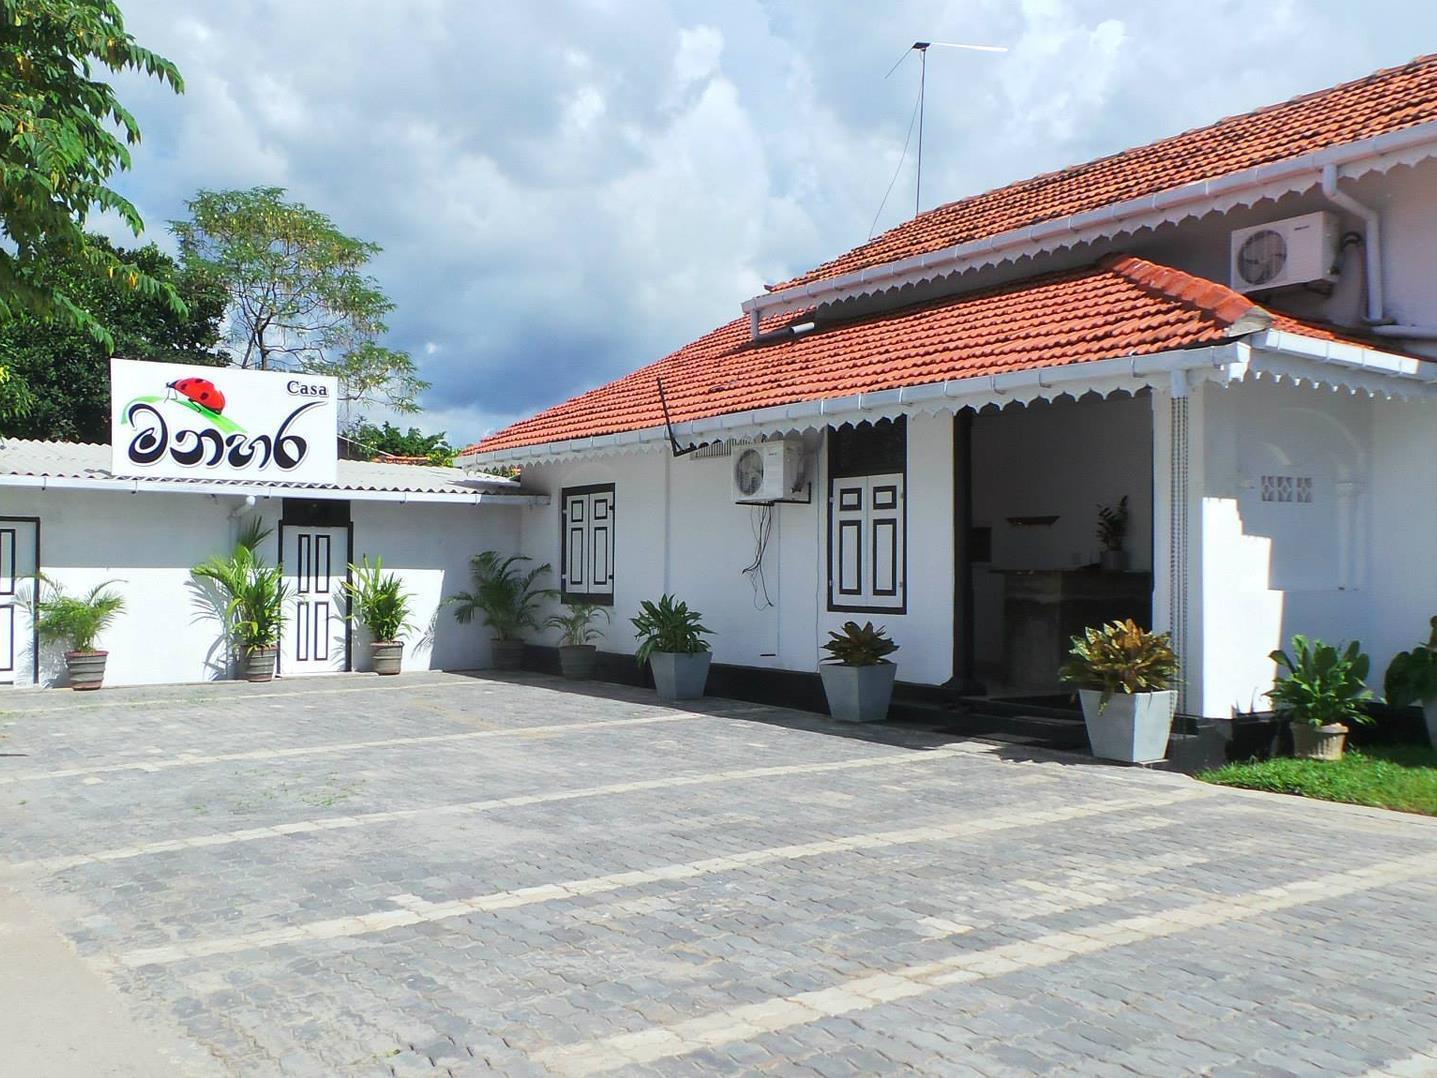 Manahara Casa Hotel And Restaurant